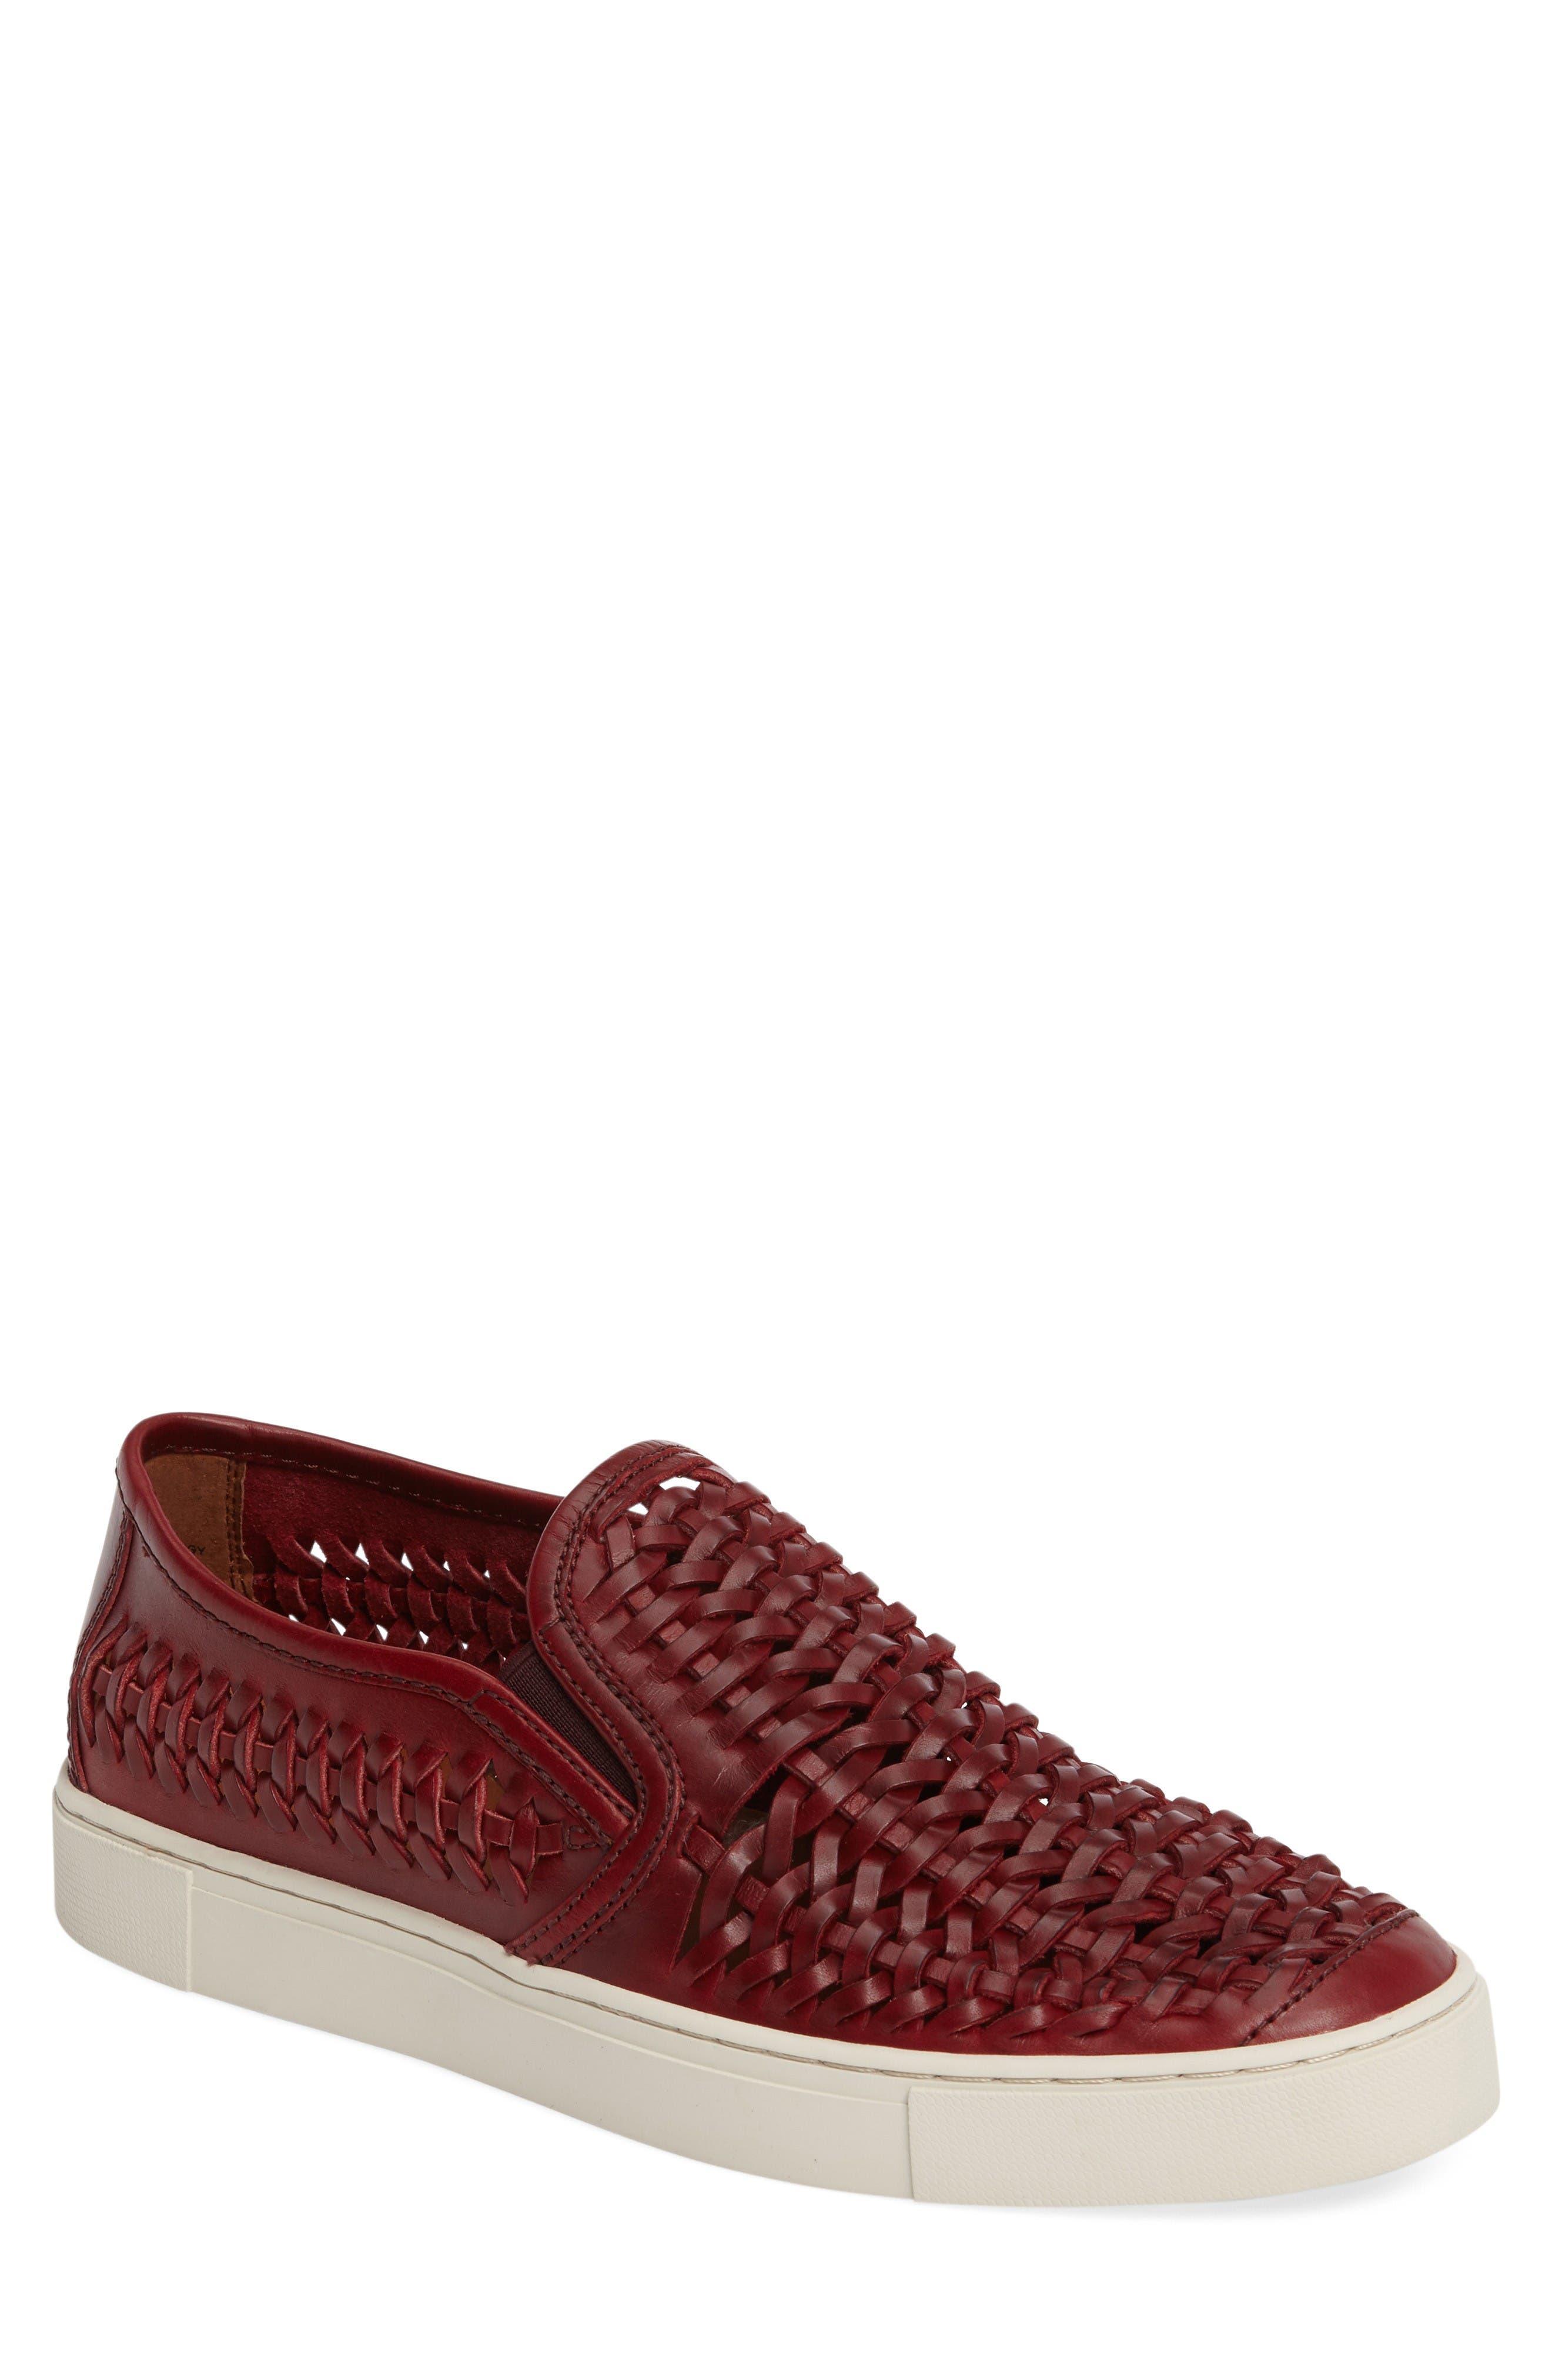 Gabe Slip-On,                             Main thumbnail 1, color,                             Burgundy Leather